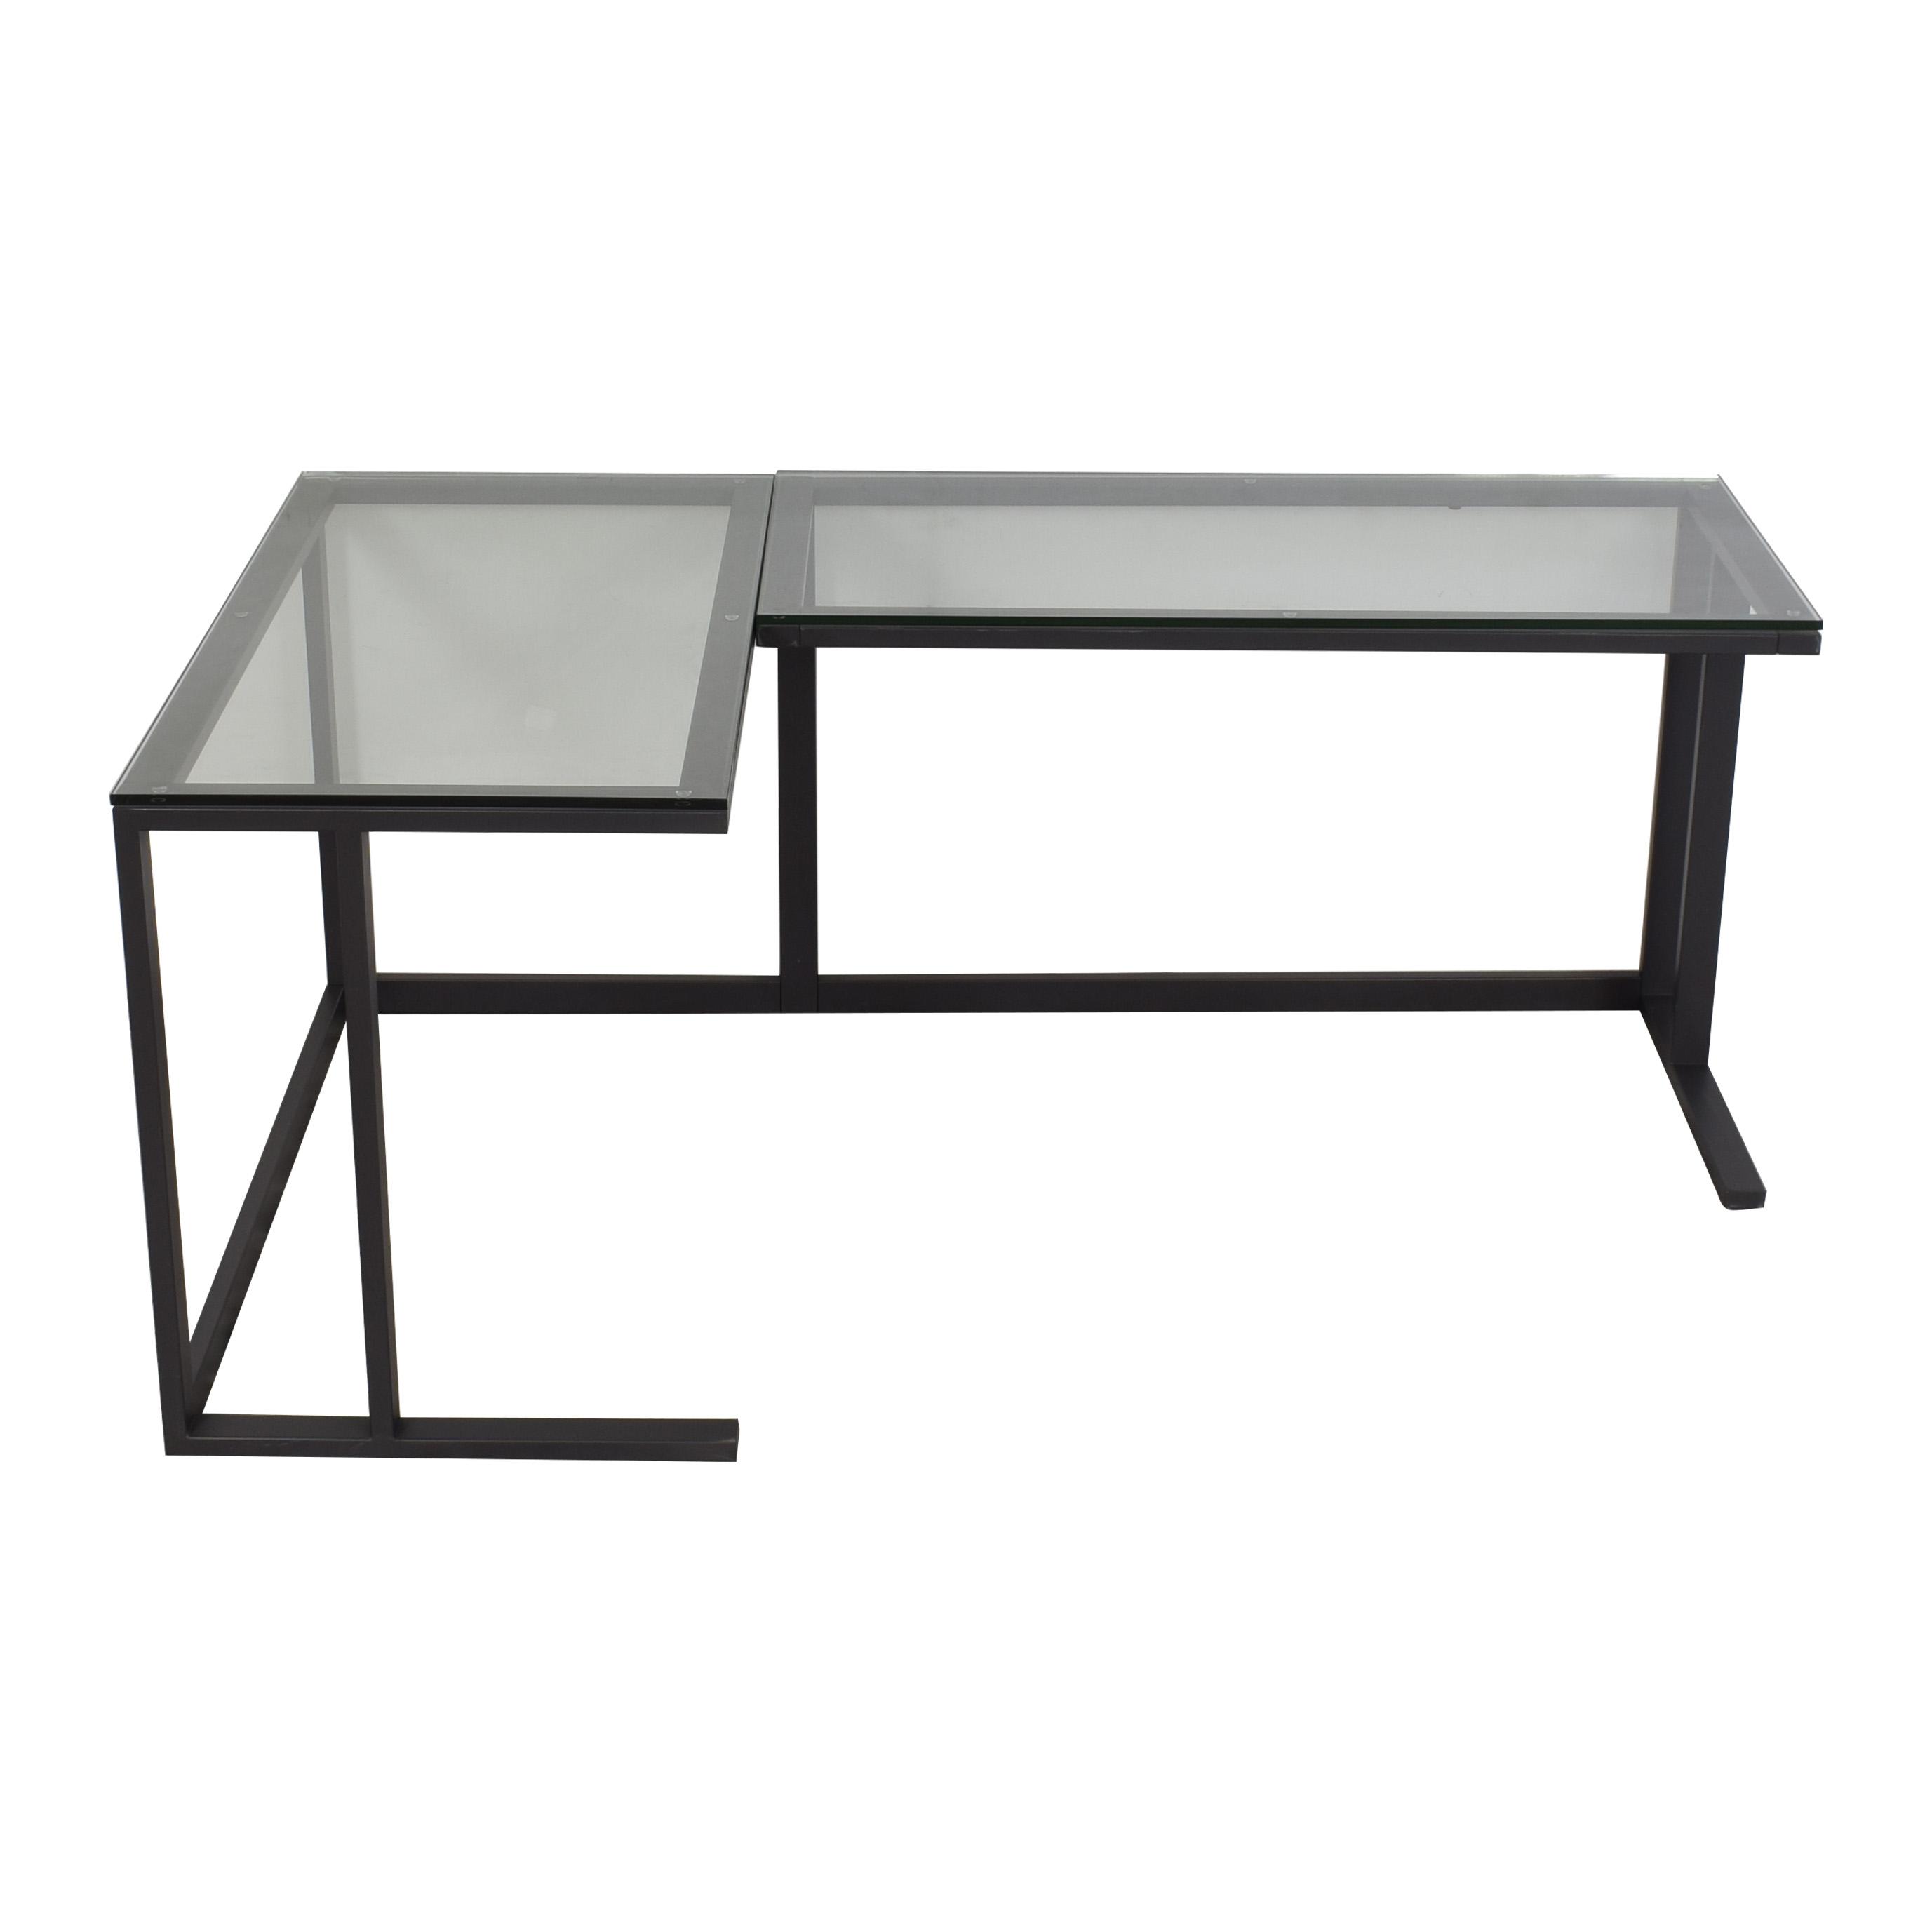 buy Crate & Barrel Pilsen Graphite Corner Desk Crate & Barrel Home Office Desks